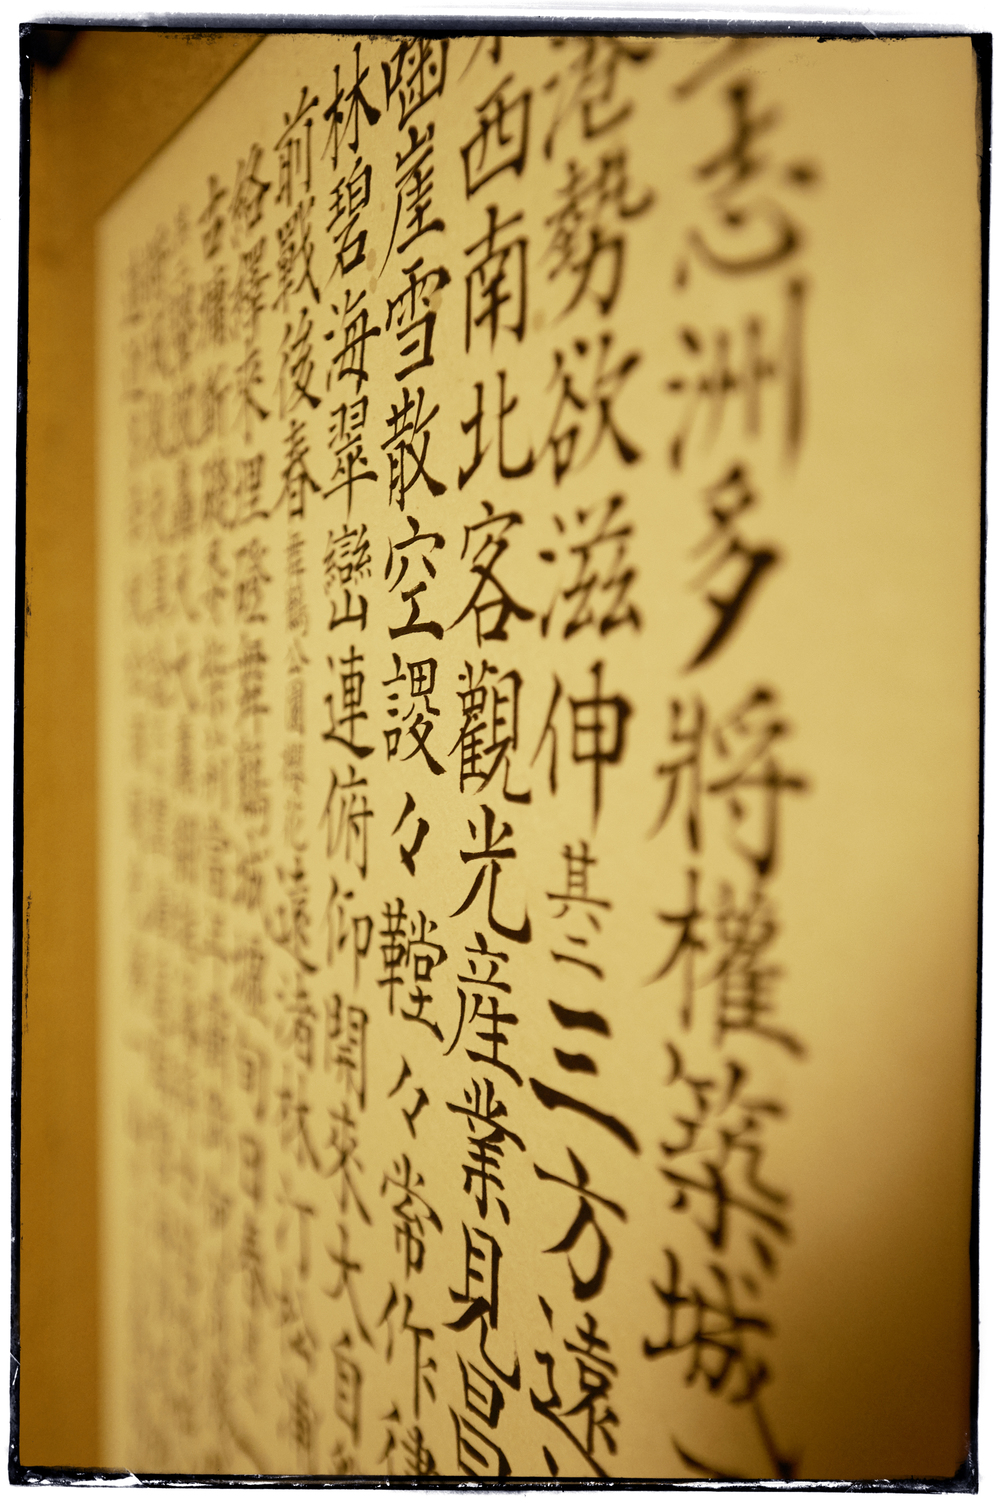 karatsu_26 copy.jpg